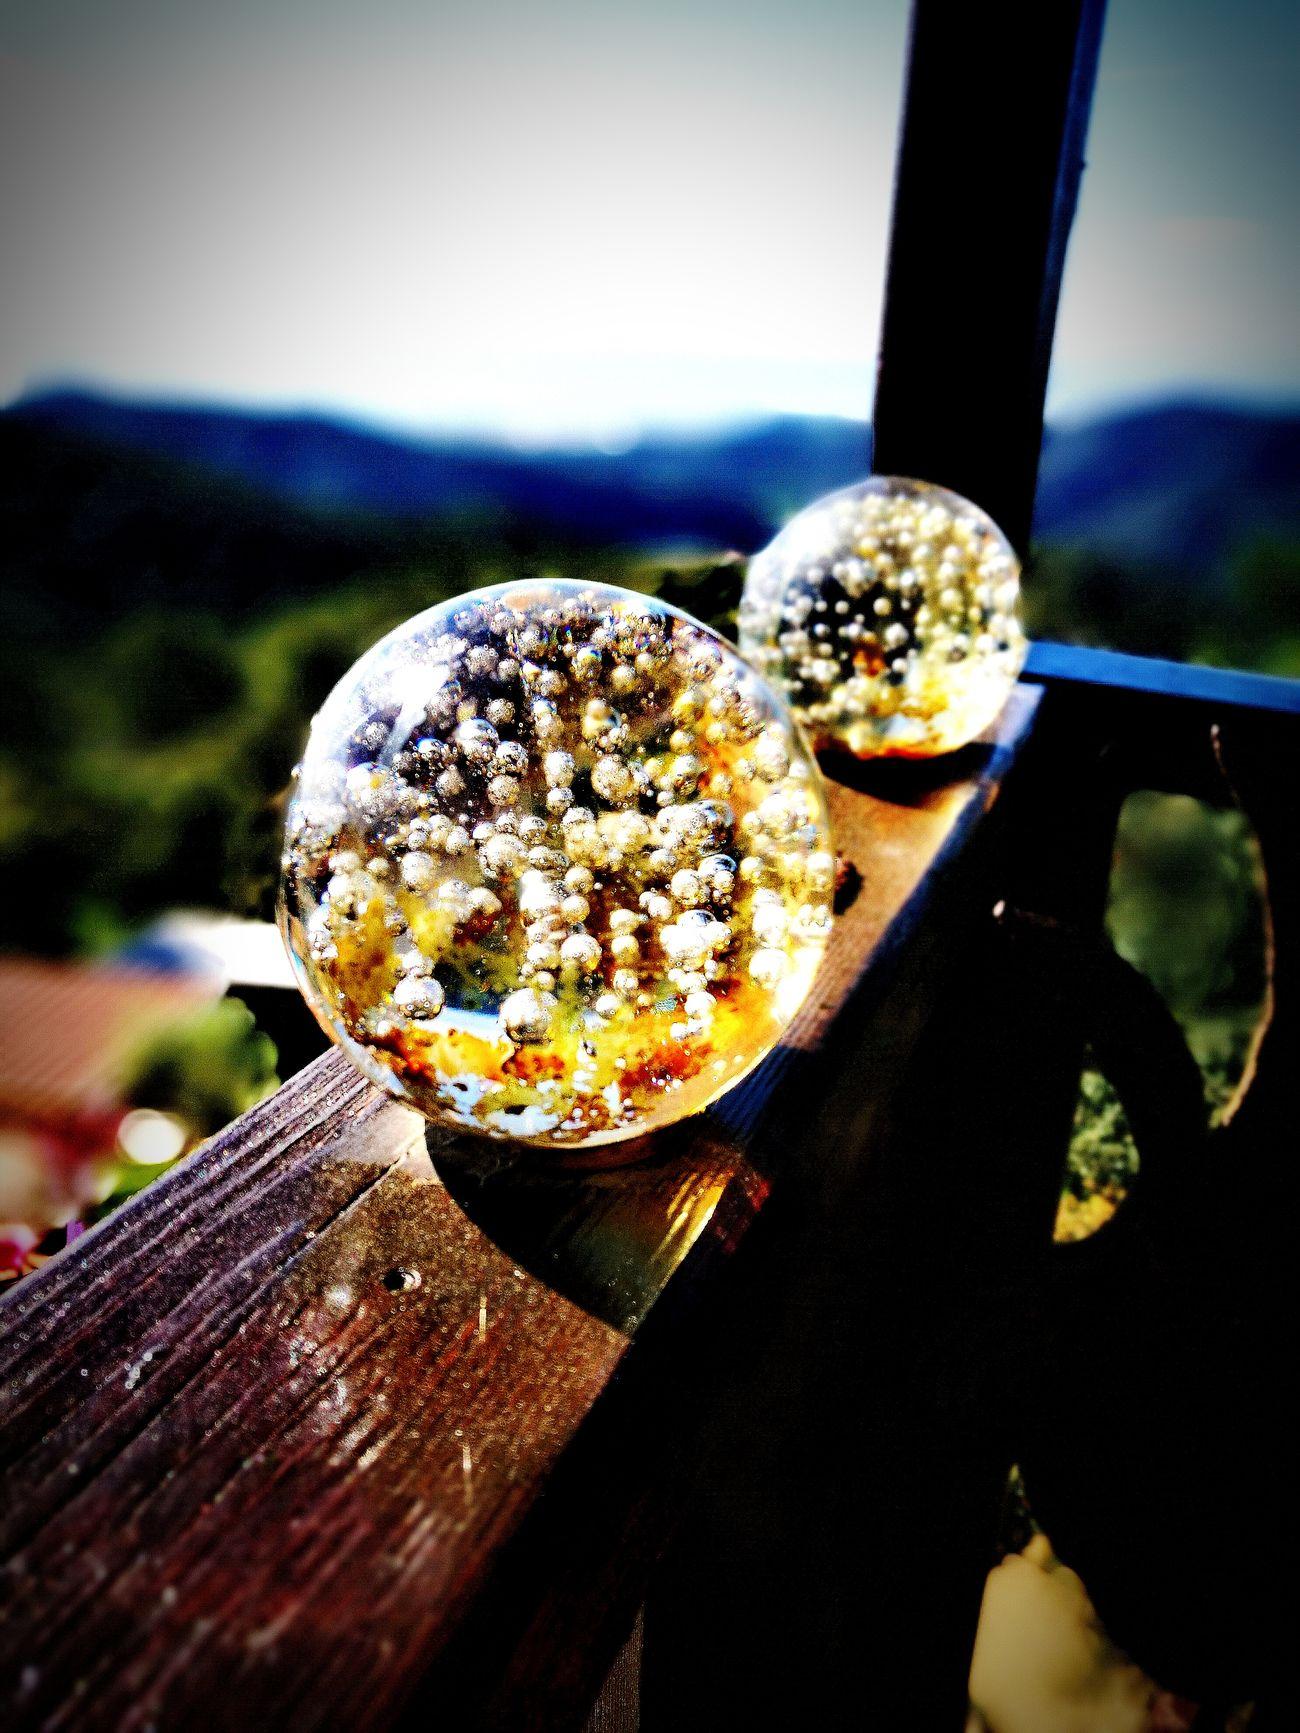 Bolas De Cristal Glass Objects  Glass Art Nature Decoracion Balcones Con Encanto